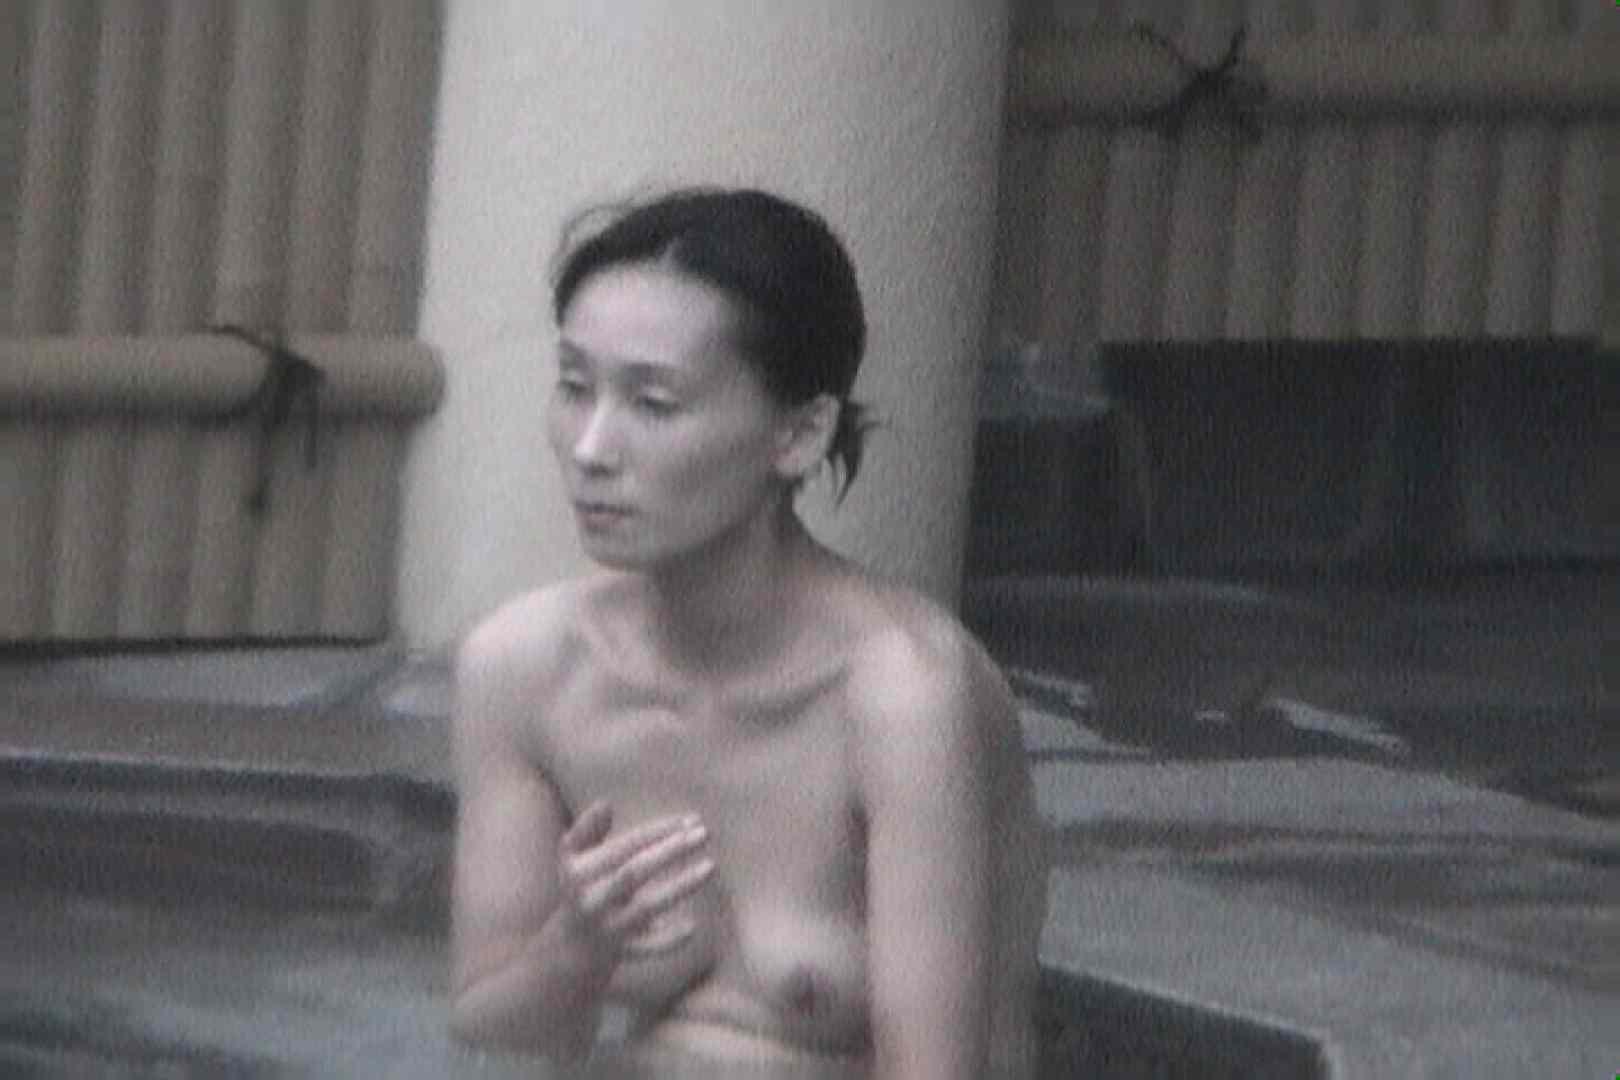 Aquaな露天風呂Vol.557 OLのエロ生活 | 露天風呂  34連発 31